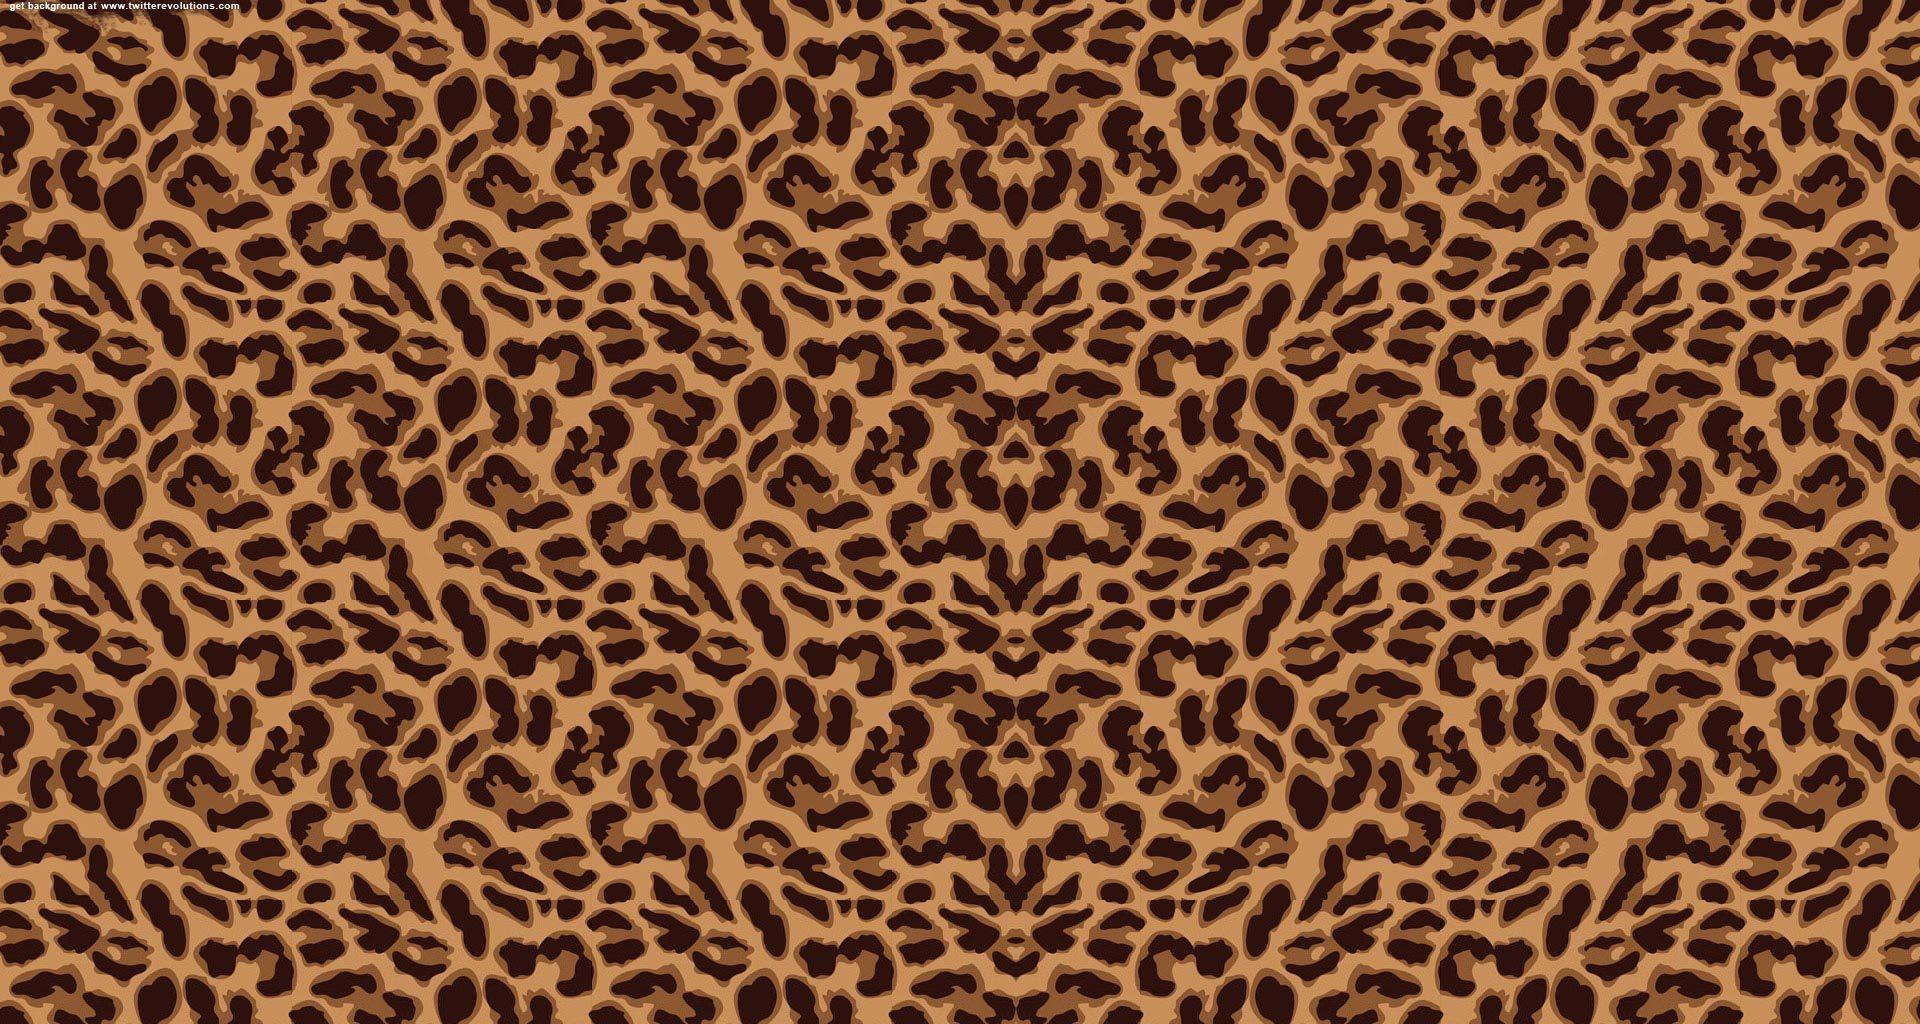 Free download leopard print twitter background [1920x1024 ...